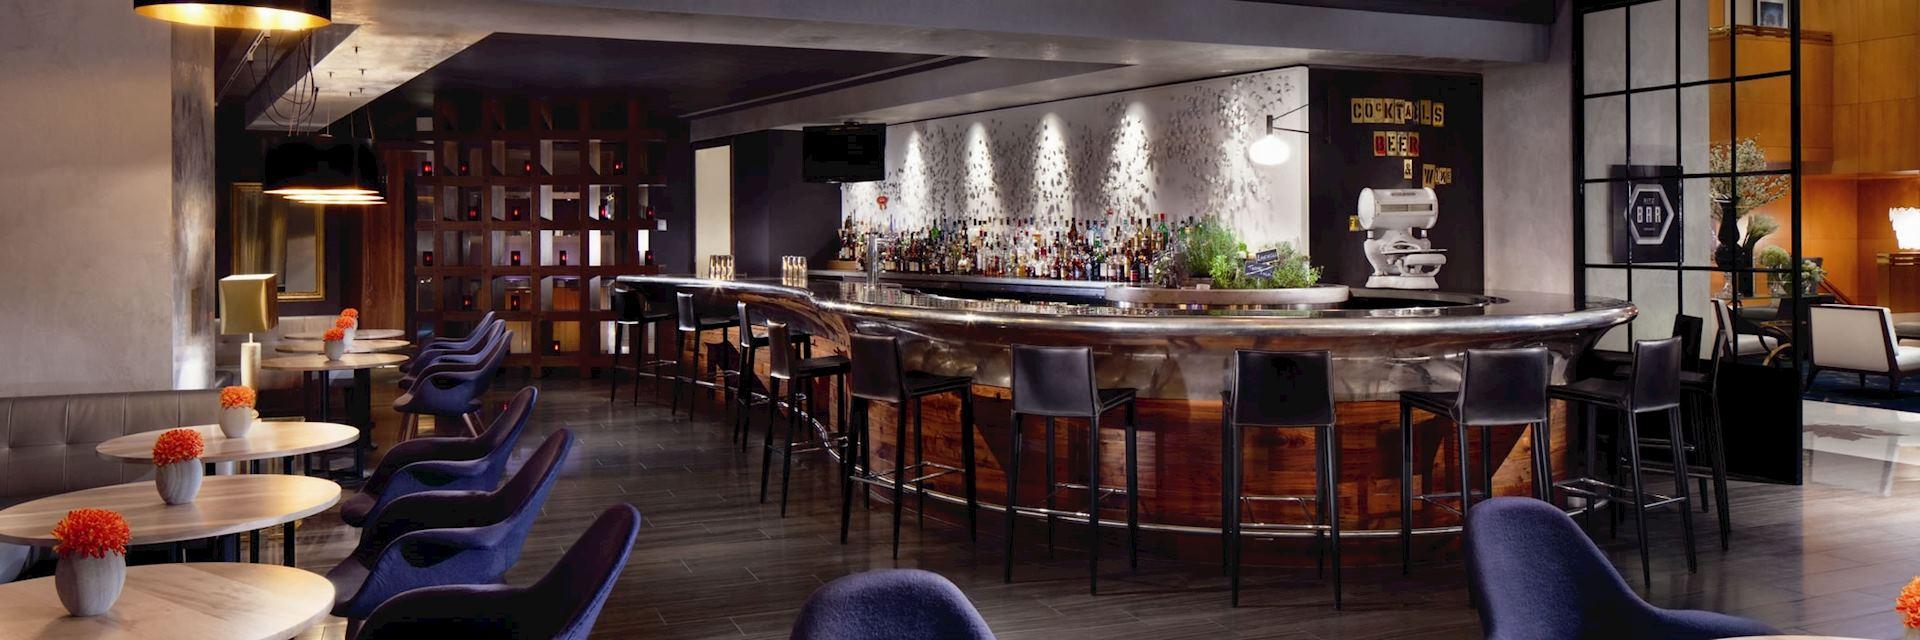 The Ritz-Carlton Toronto